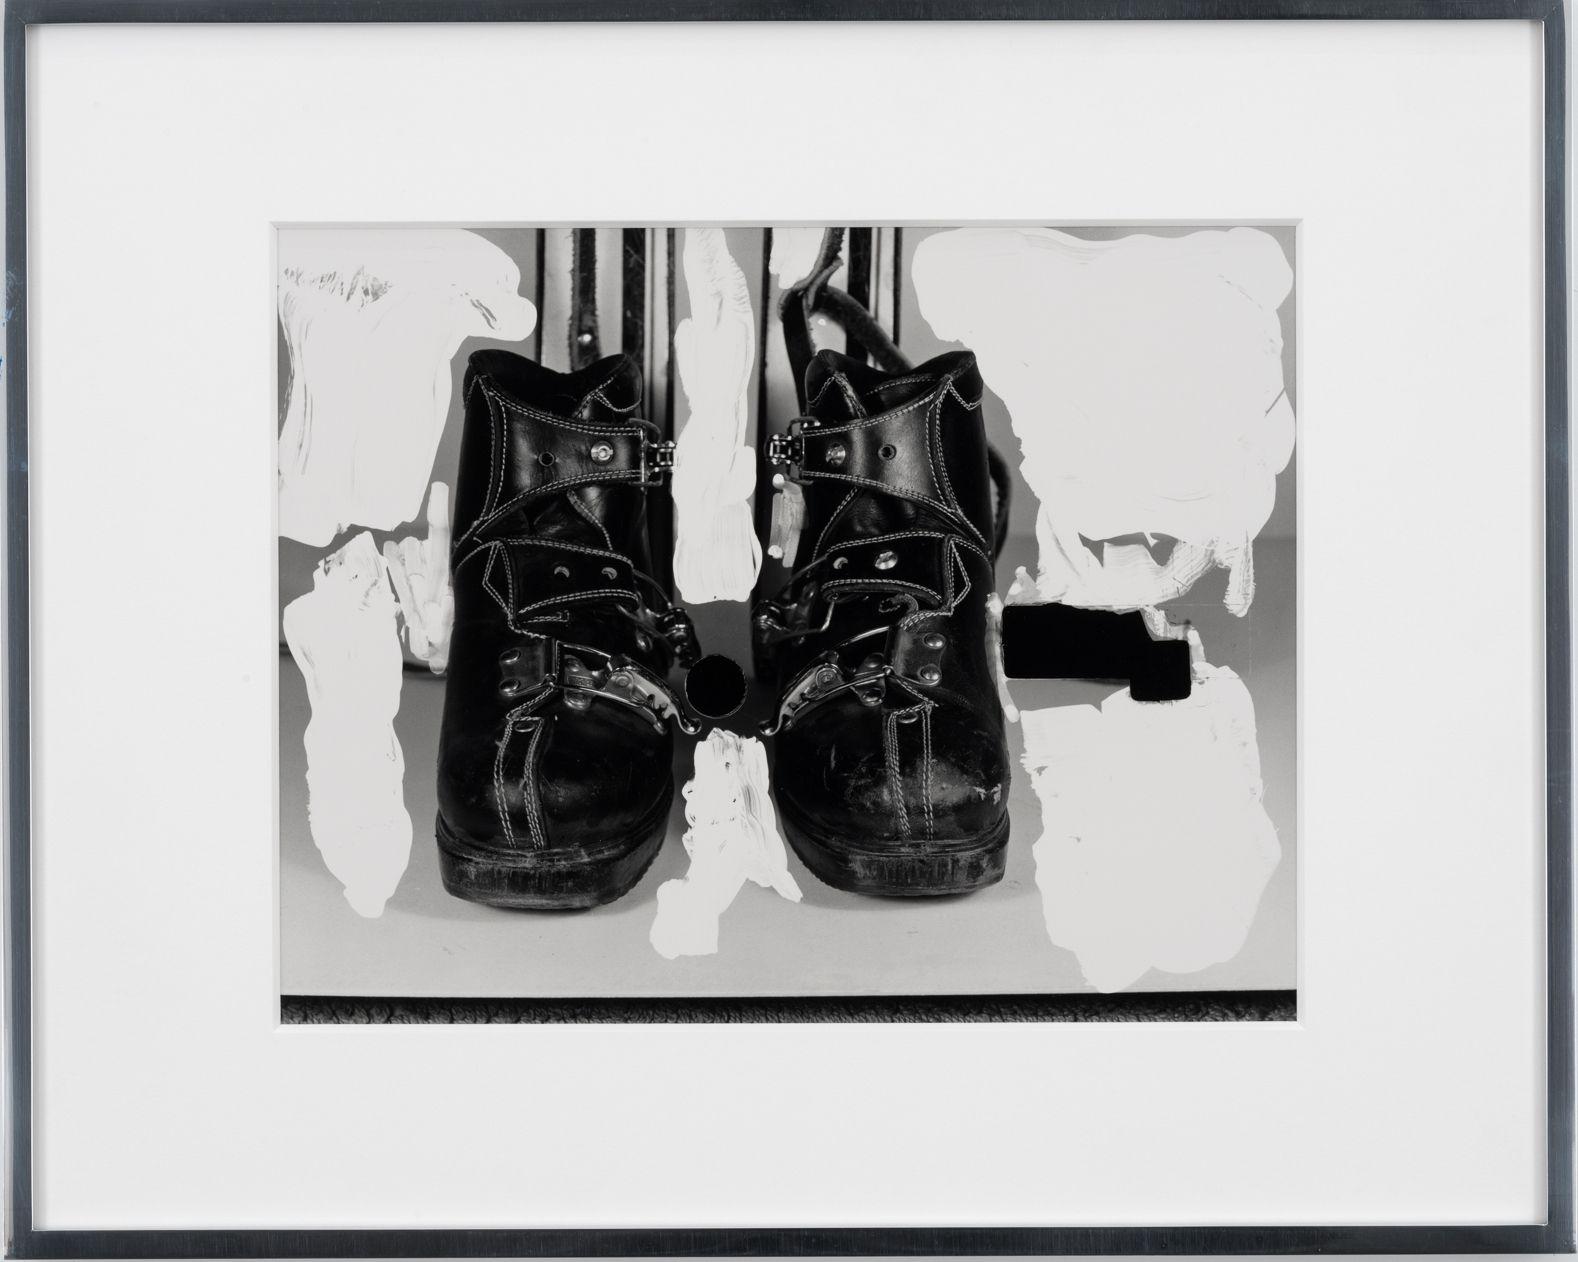 Elad Lassry, Untitled (Ski Set, detail), 2018